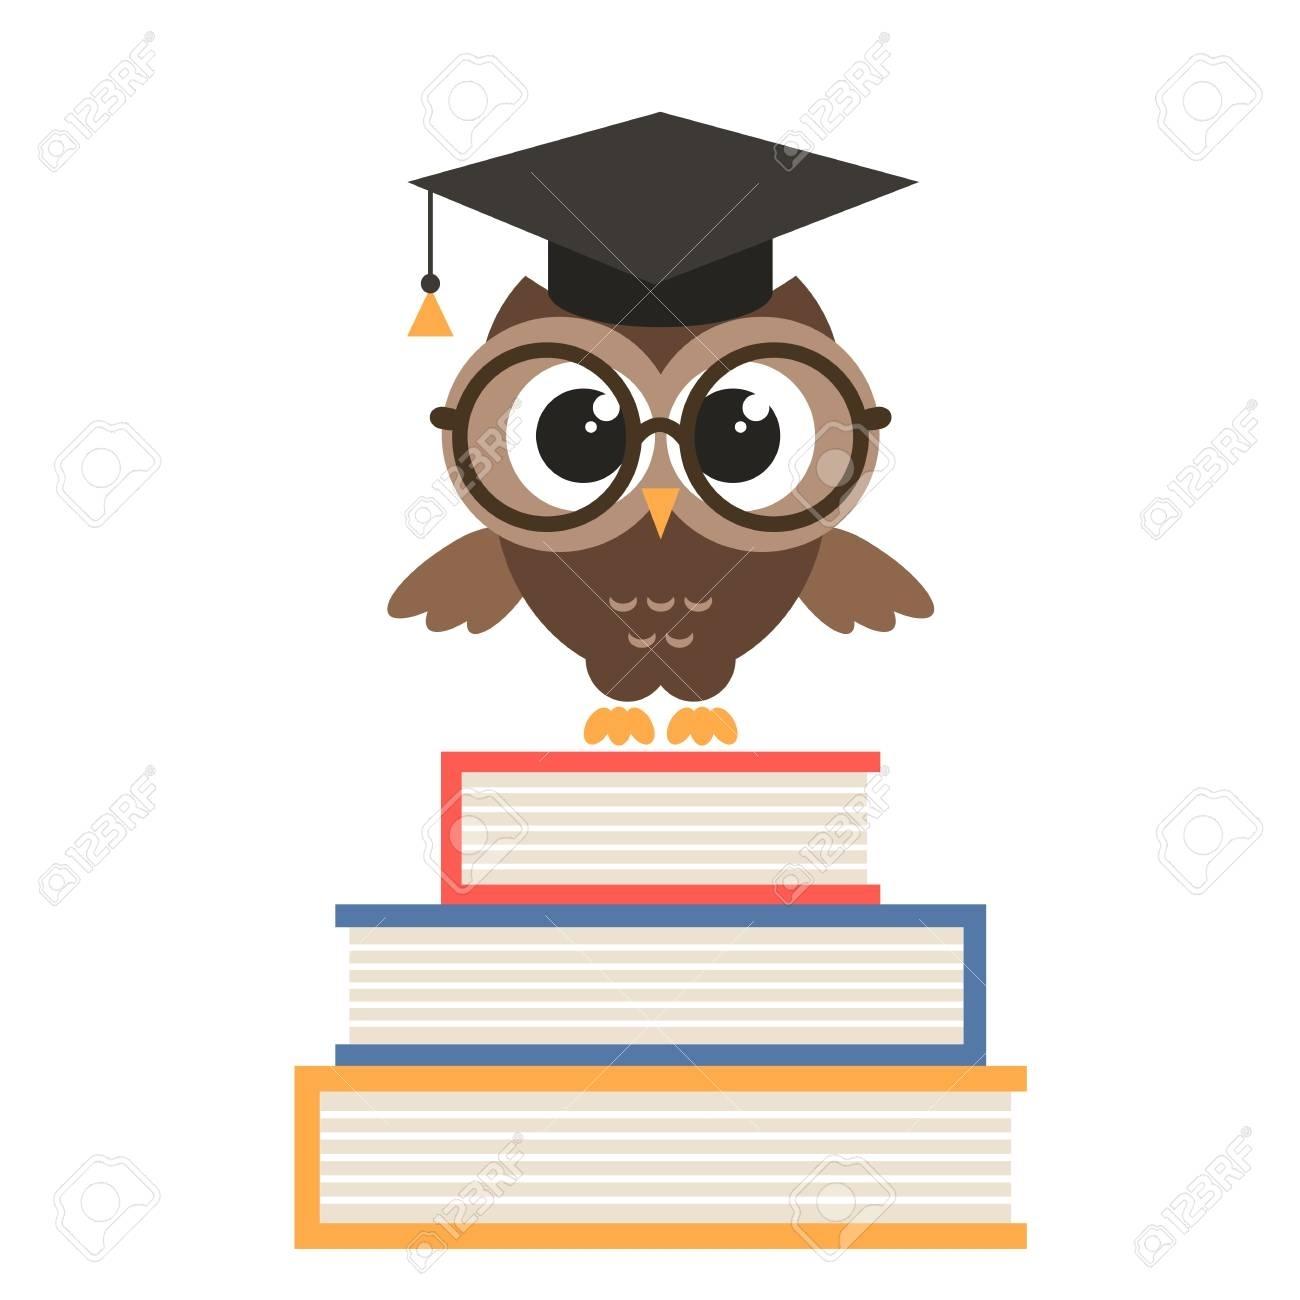 Graduation Owl Clipart.